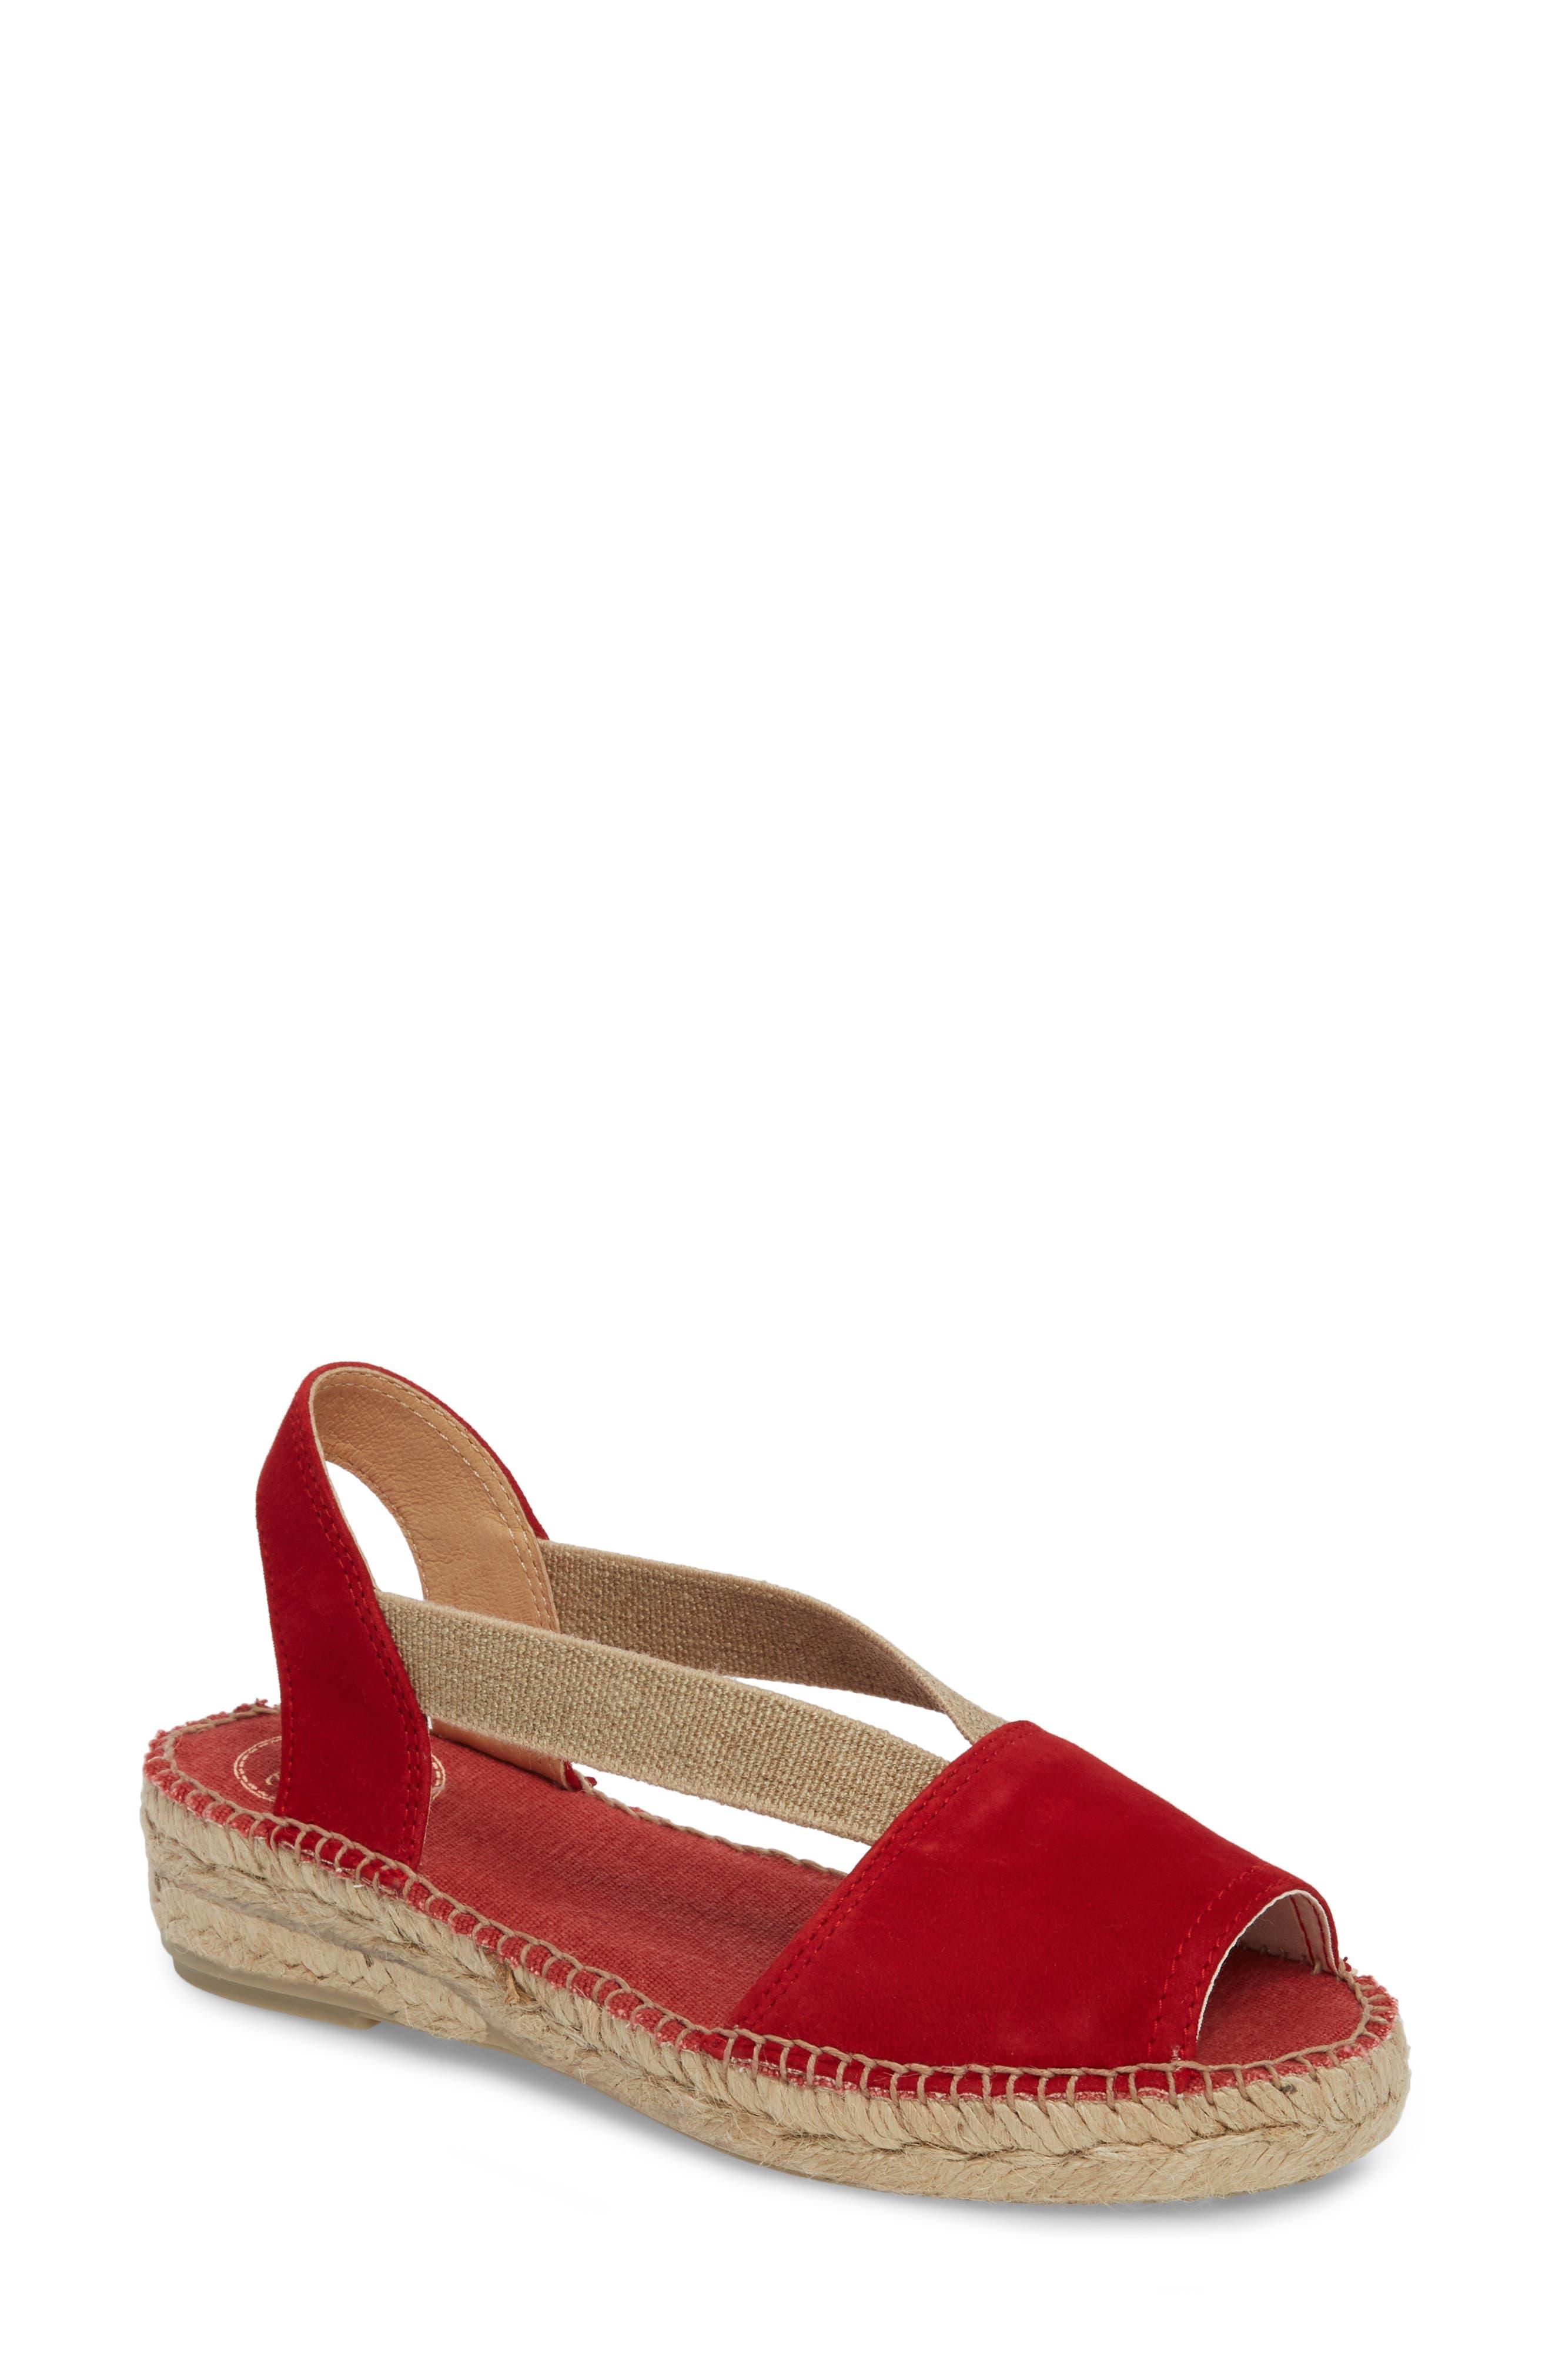 Ella Espadrille Sandal,                         Main,                         color, Red Suede